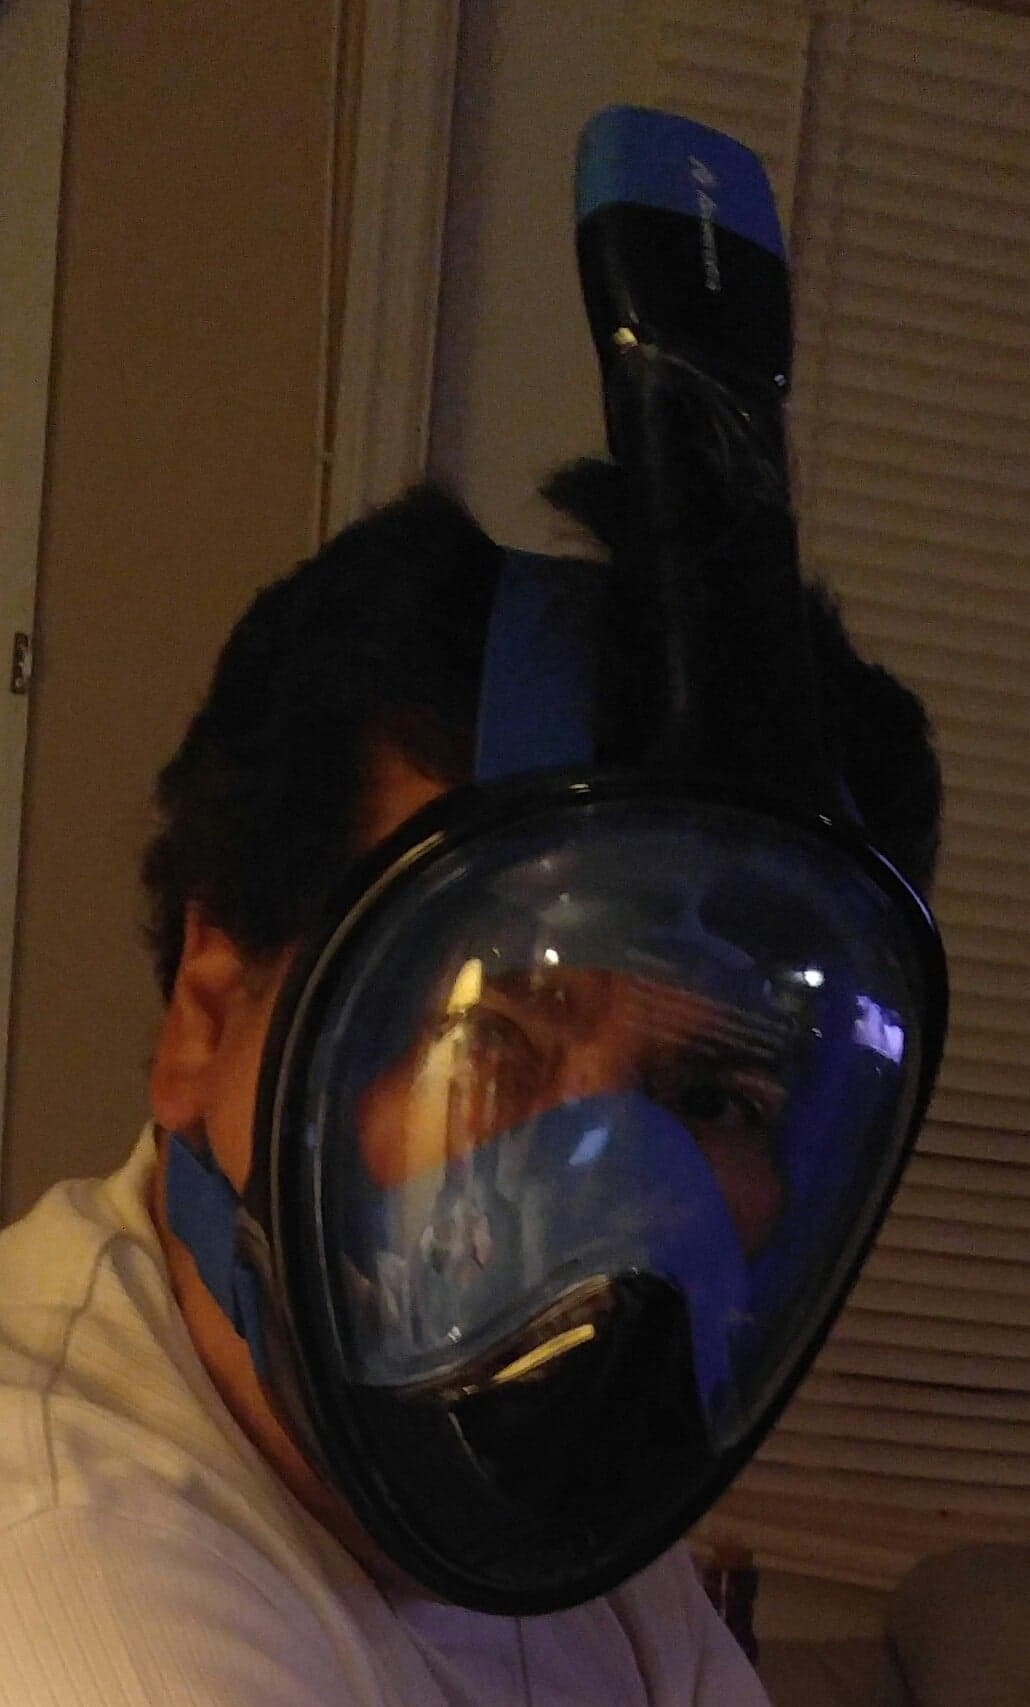 Snorkel mask 180°